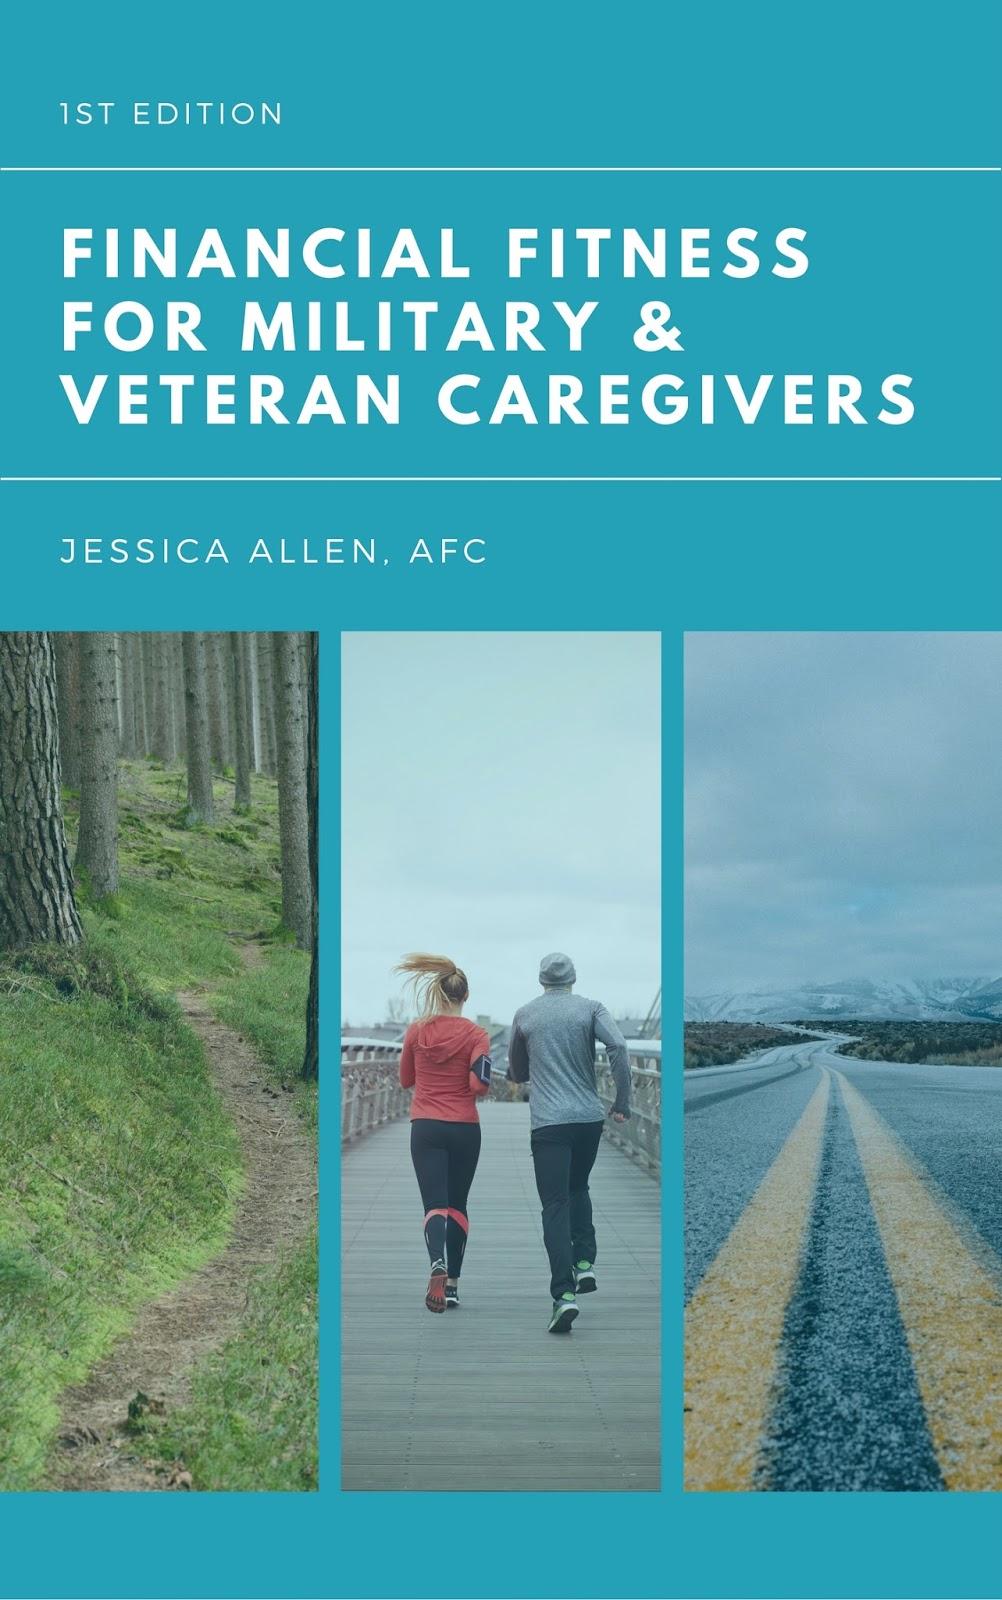 The war of a wounded warrior wife httpsamazonfinancial fitness military veteran caregivers ebookdpb0761z2hvxrefsr11ieutf8qid1507898157sr8 1keywordsfinancialfitness fandeluxe PDF